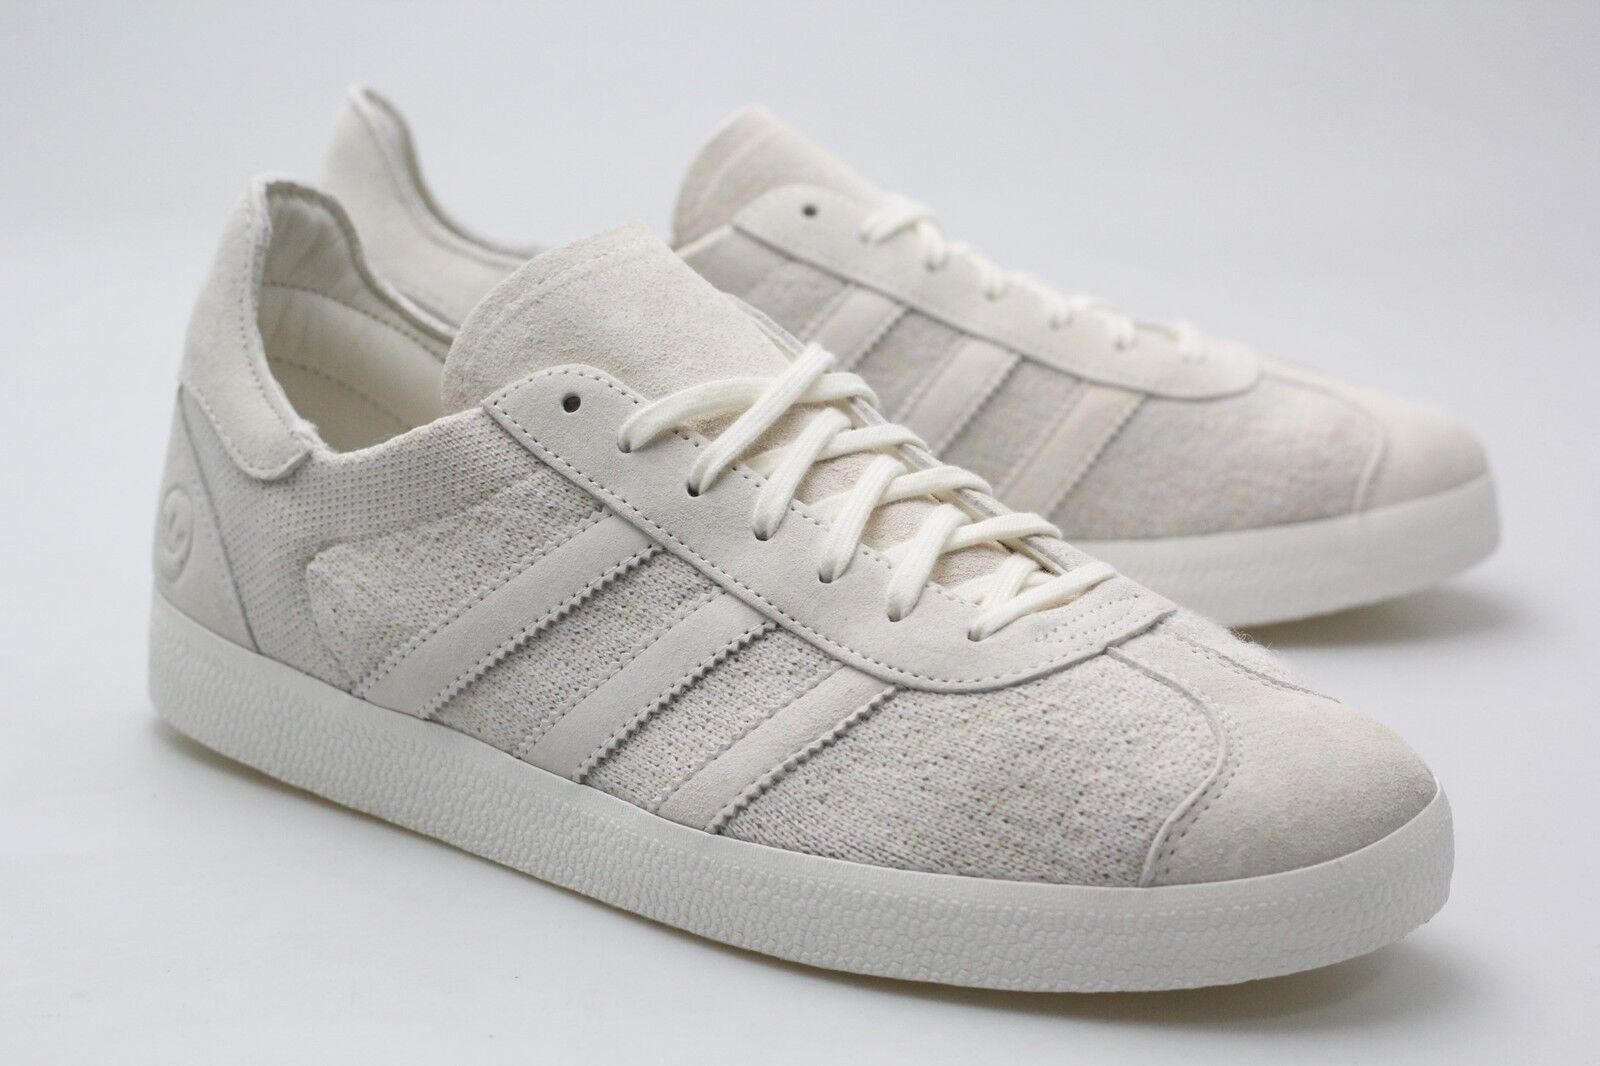 Adidas Consortium x Wings And Horns Men Gazelle Primeknit white off white BB3750